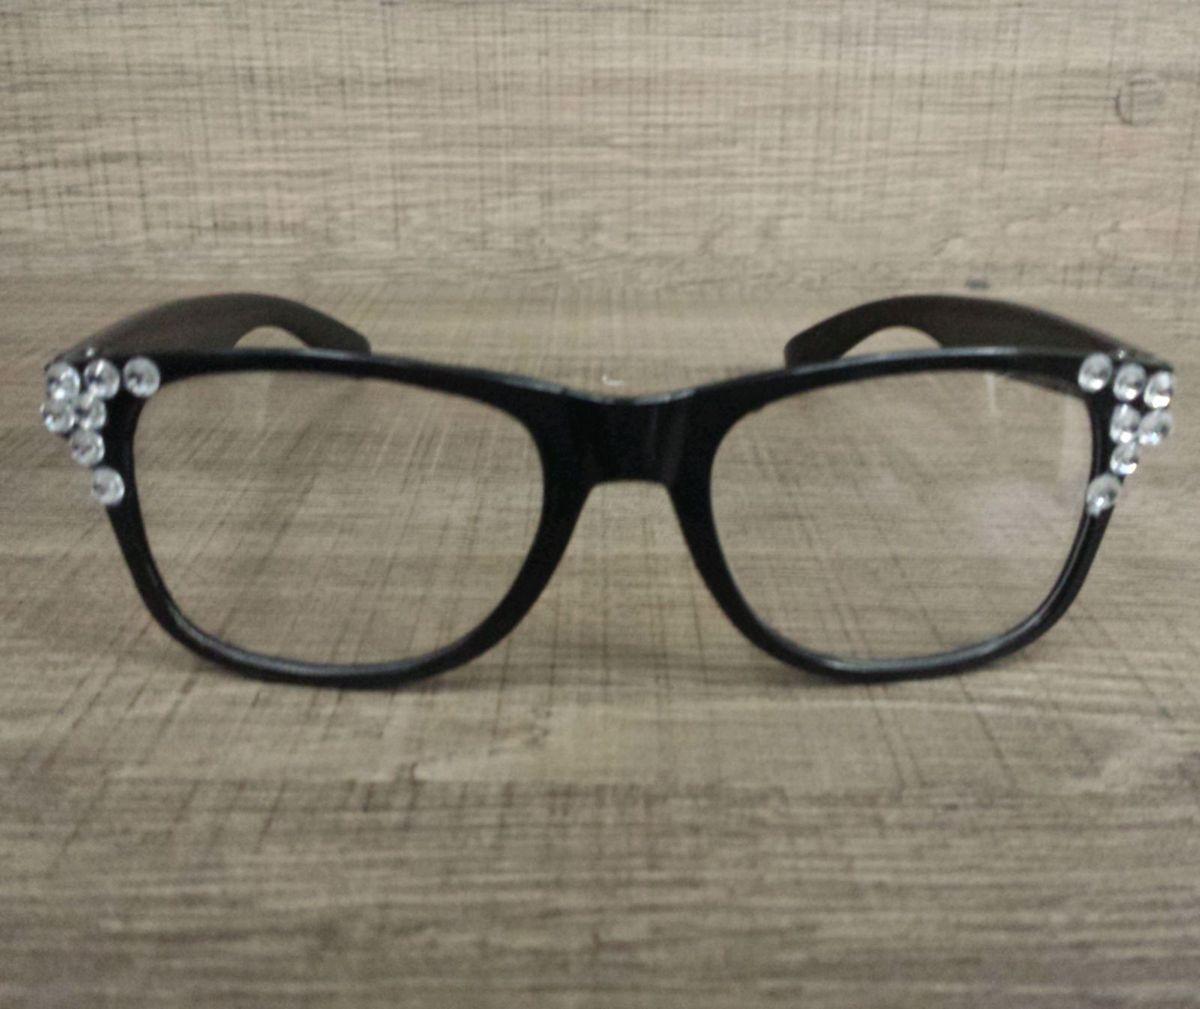 20e002c022384 1 óculos larissa manoela sbt cúmplice de um resgate pronta entrega -